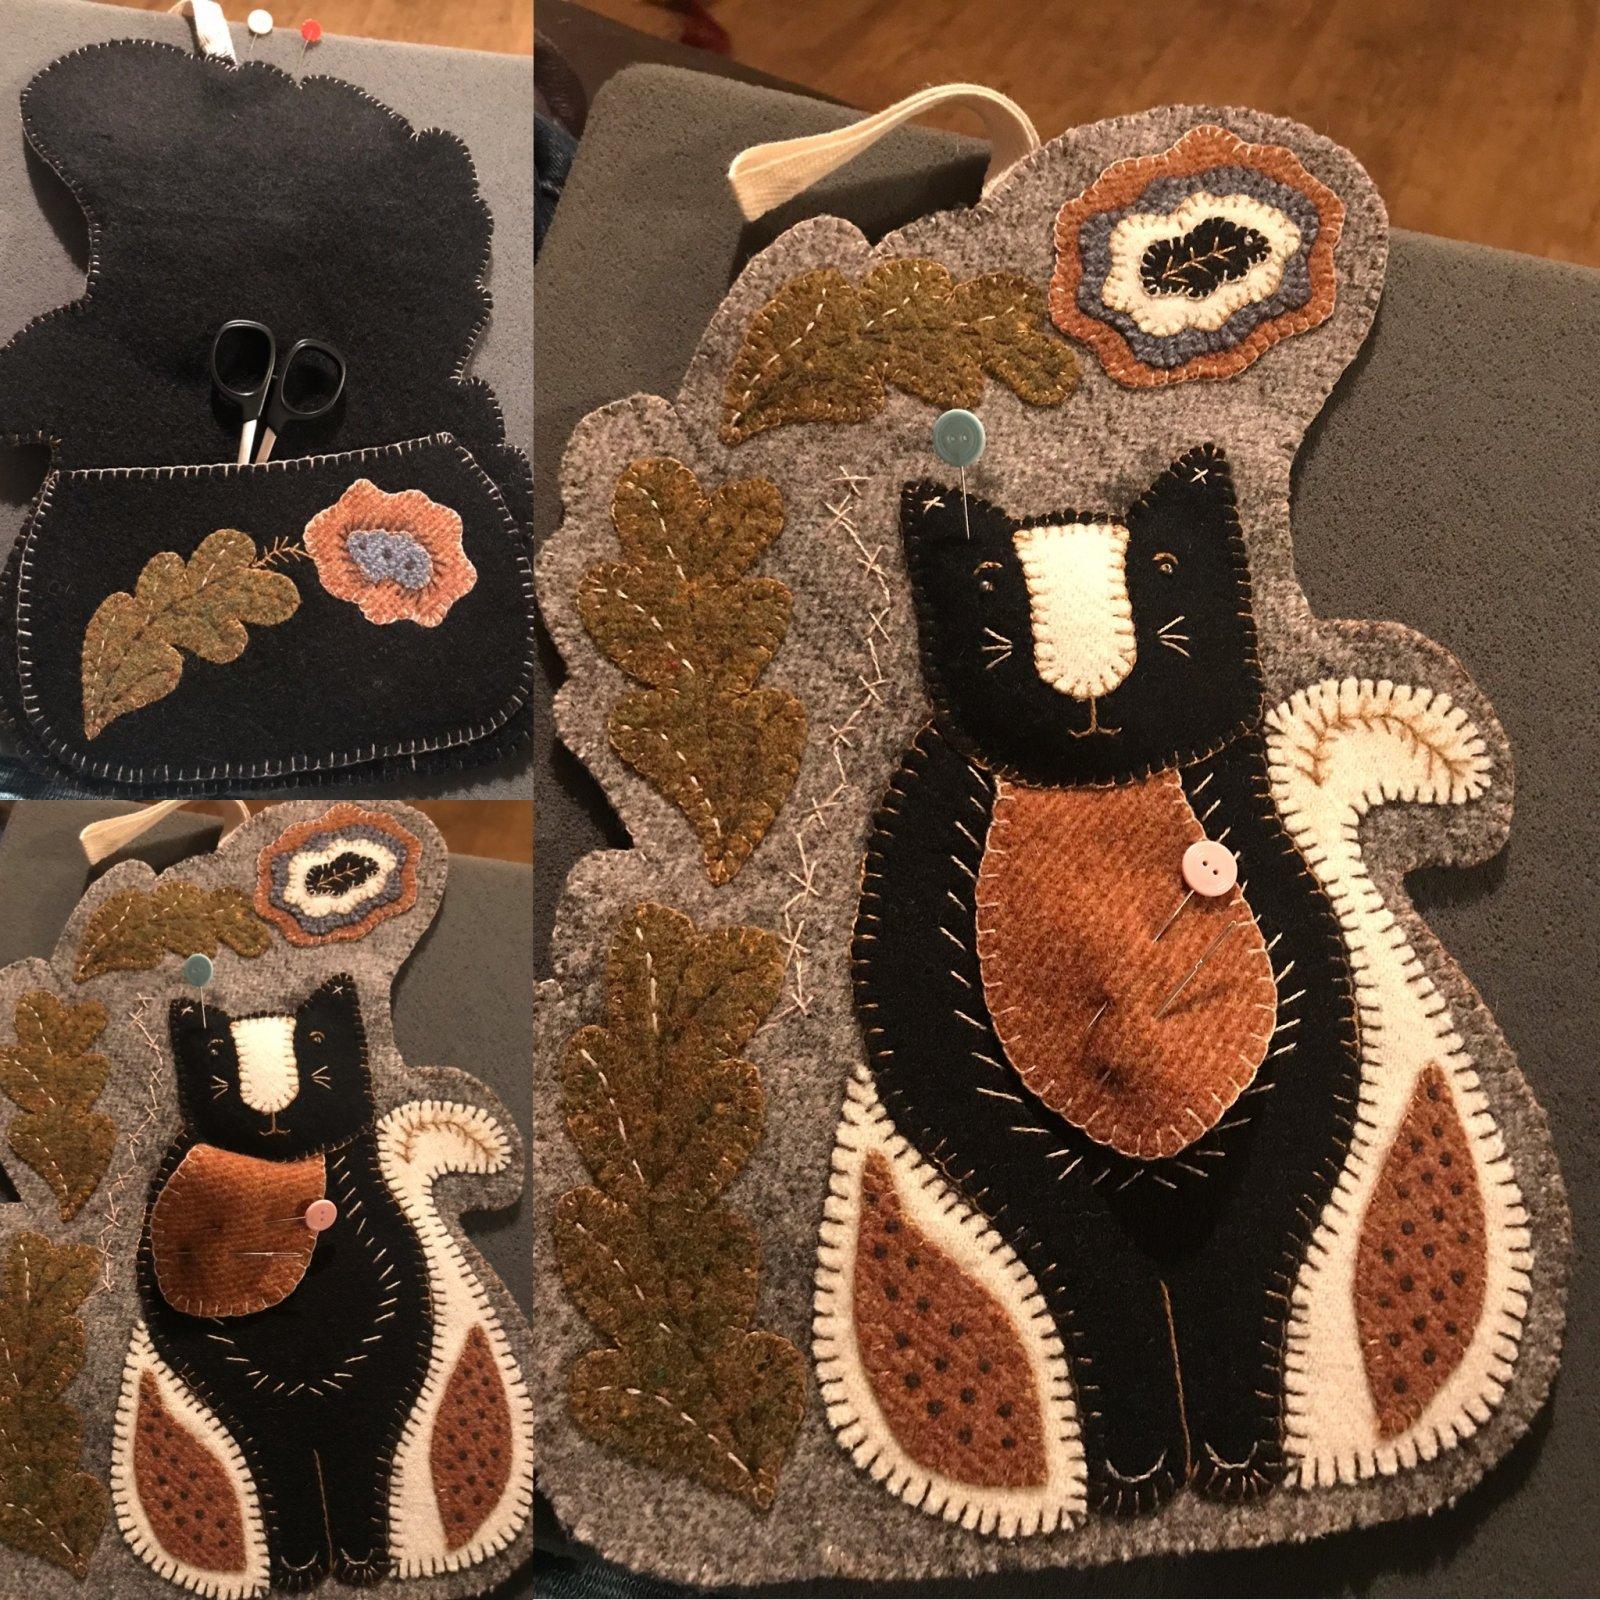 Kitty Sewing Caddy Wool Kit & Pattern by Rebekah Smith